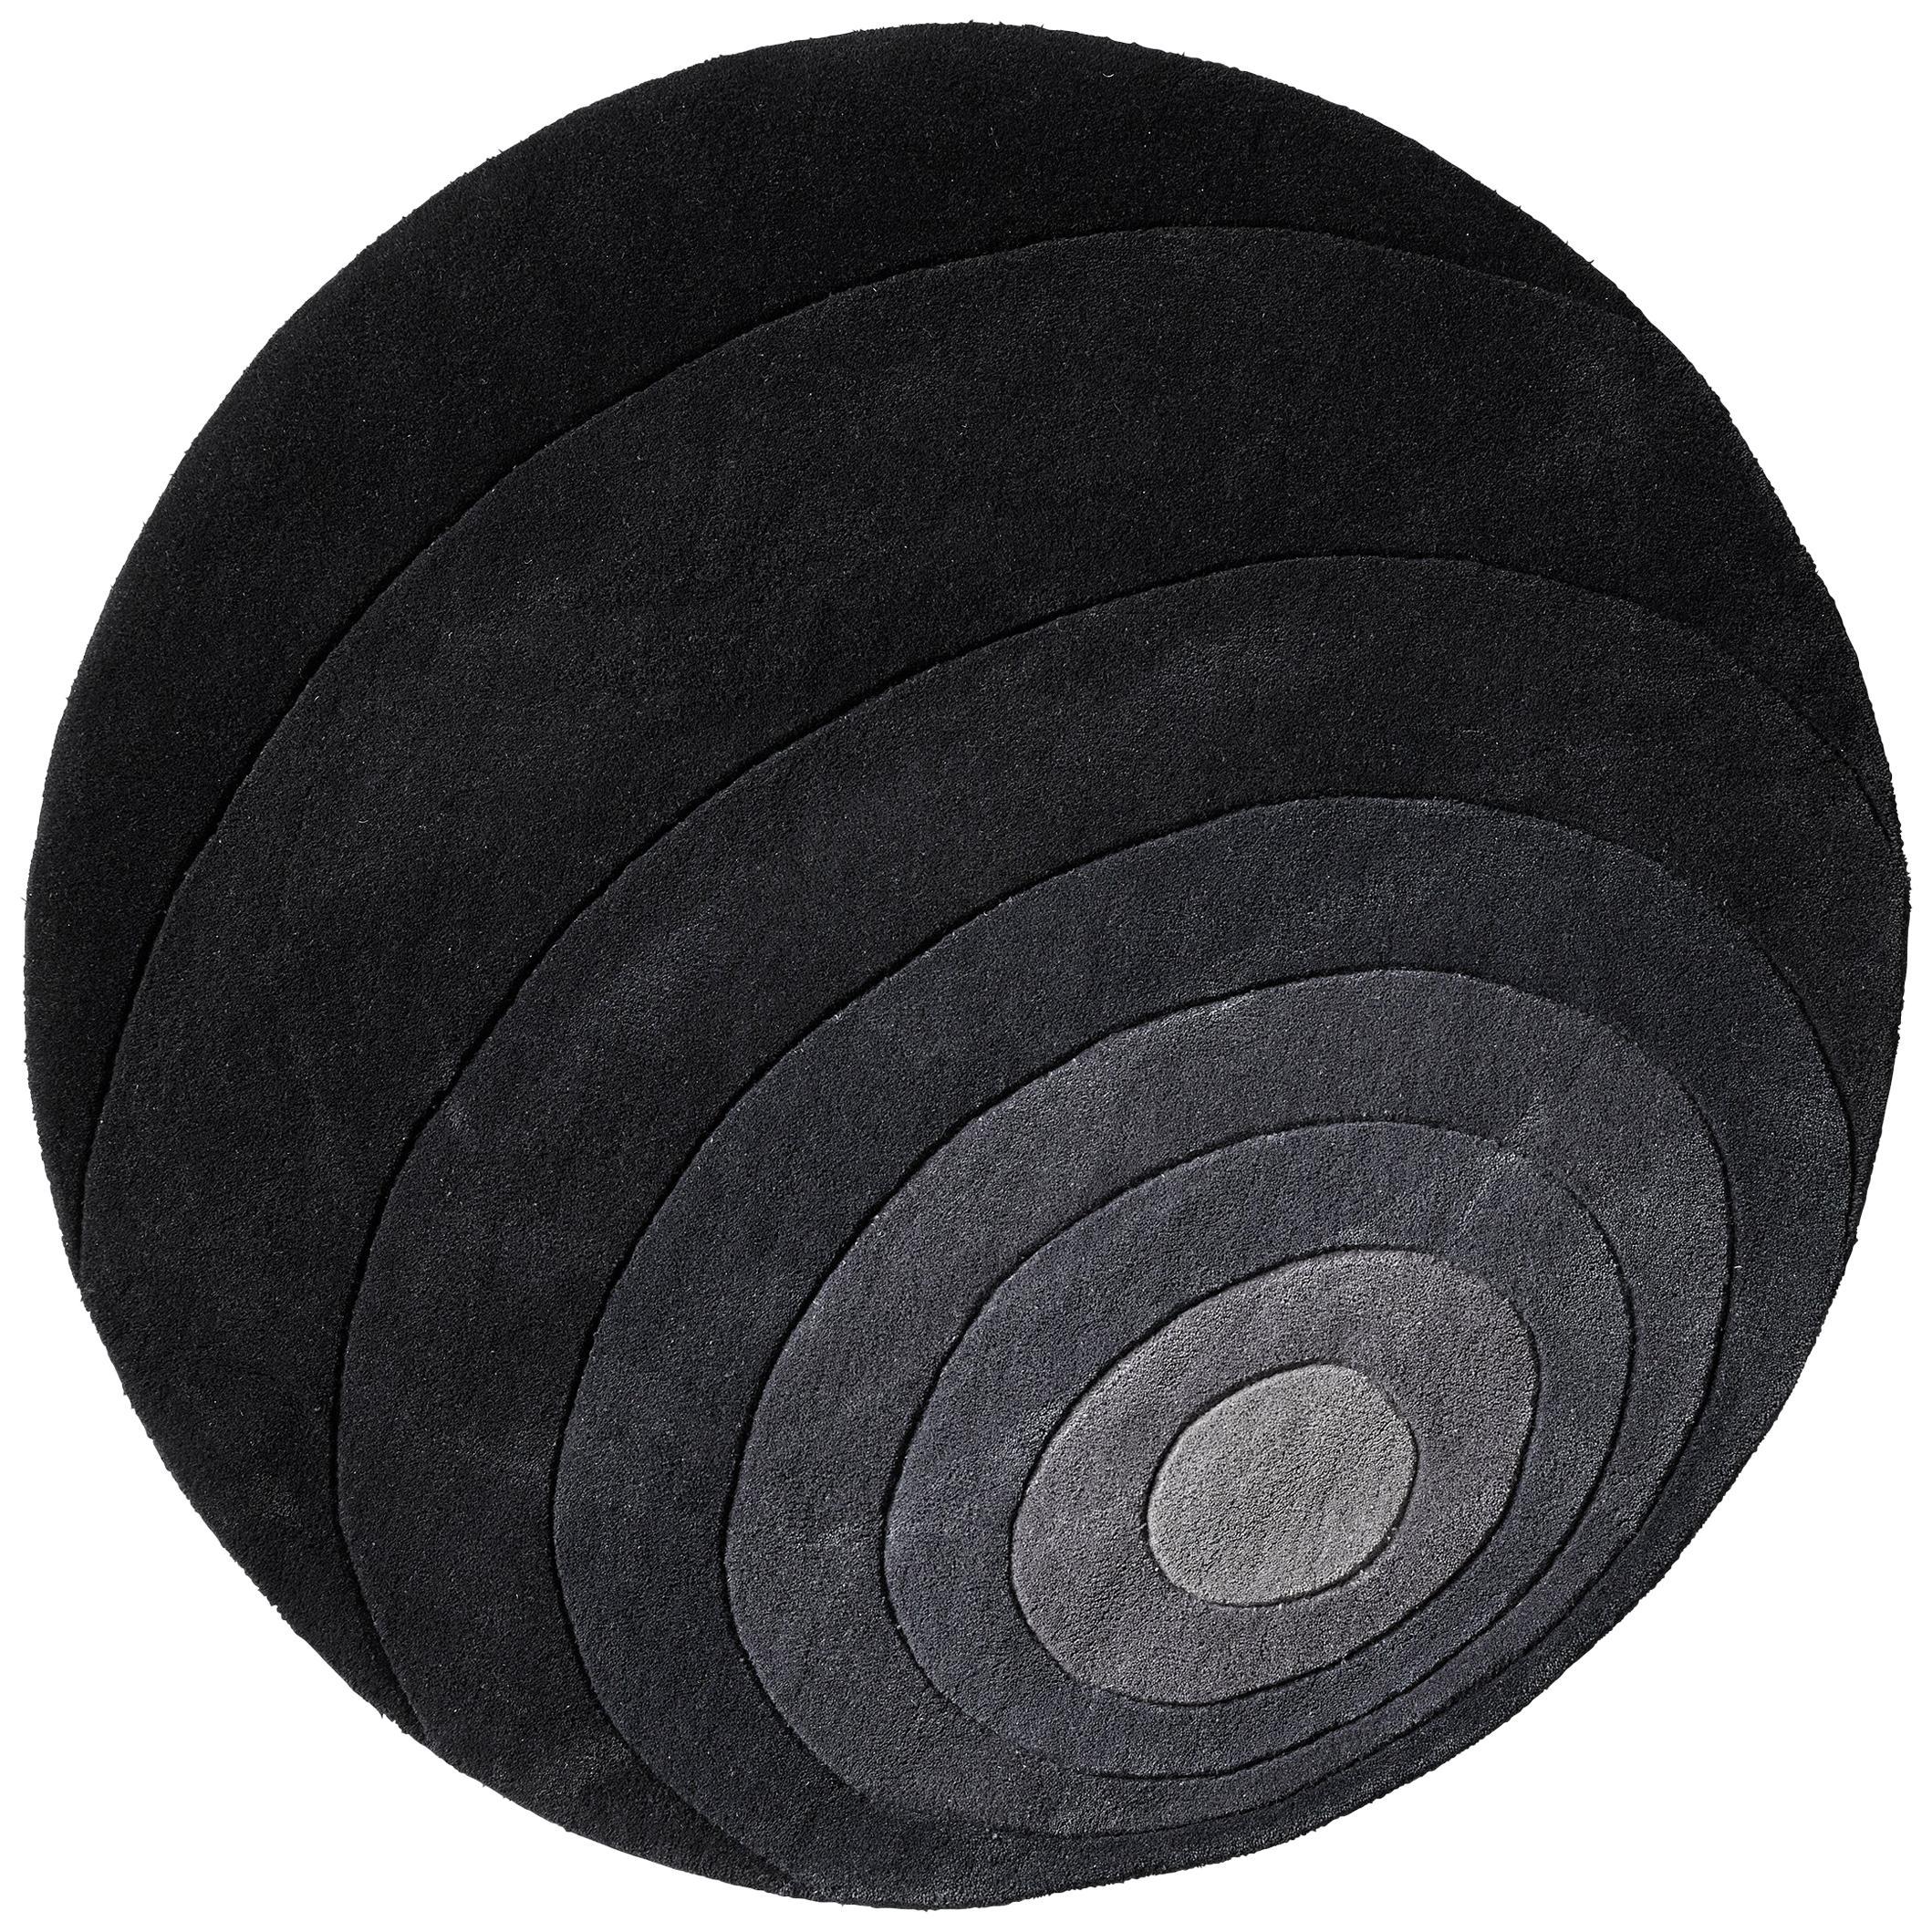 Luna Hand-Tufted Rug in Dark Gray by Verner Panton